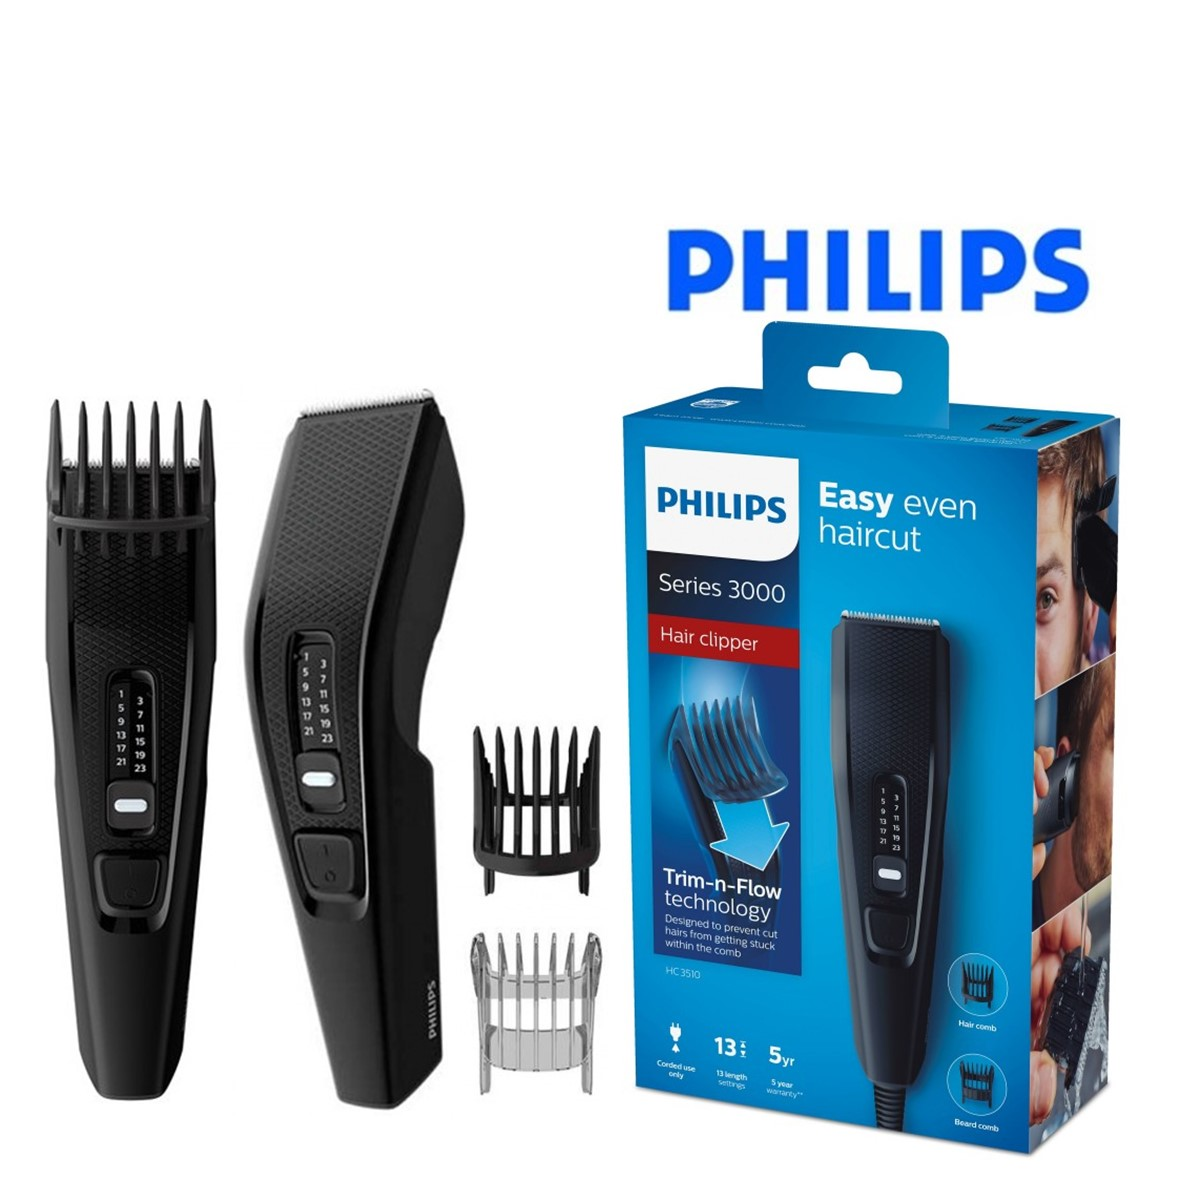 Cortapelos Philips HC3510 15 Negro - You Like It fdcb656b4390